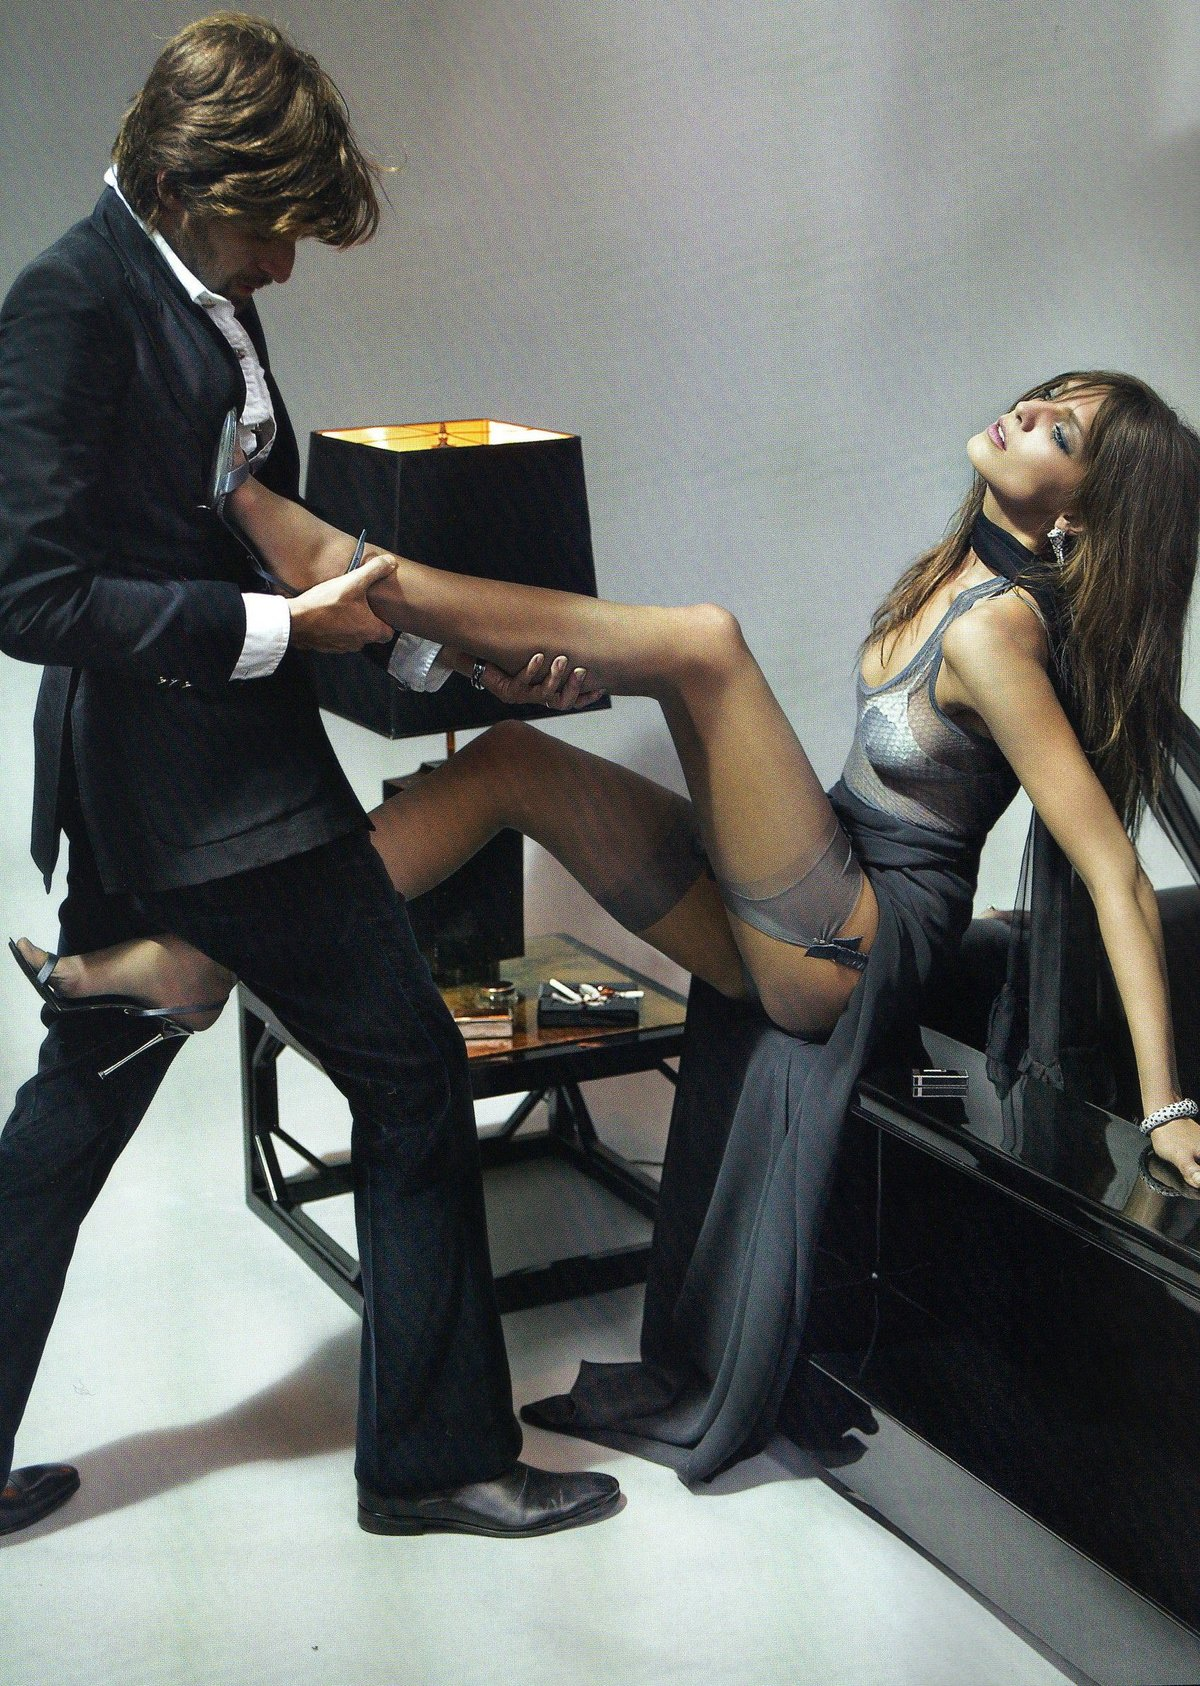 Девушка заводит парня в чулках #14